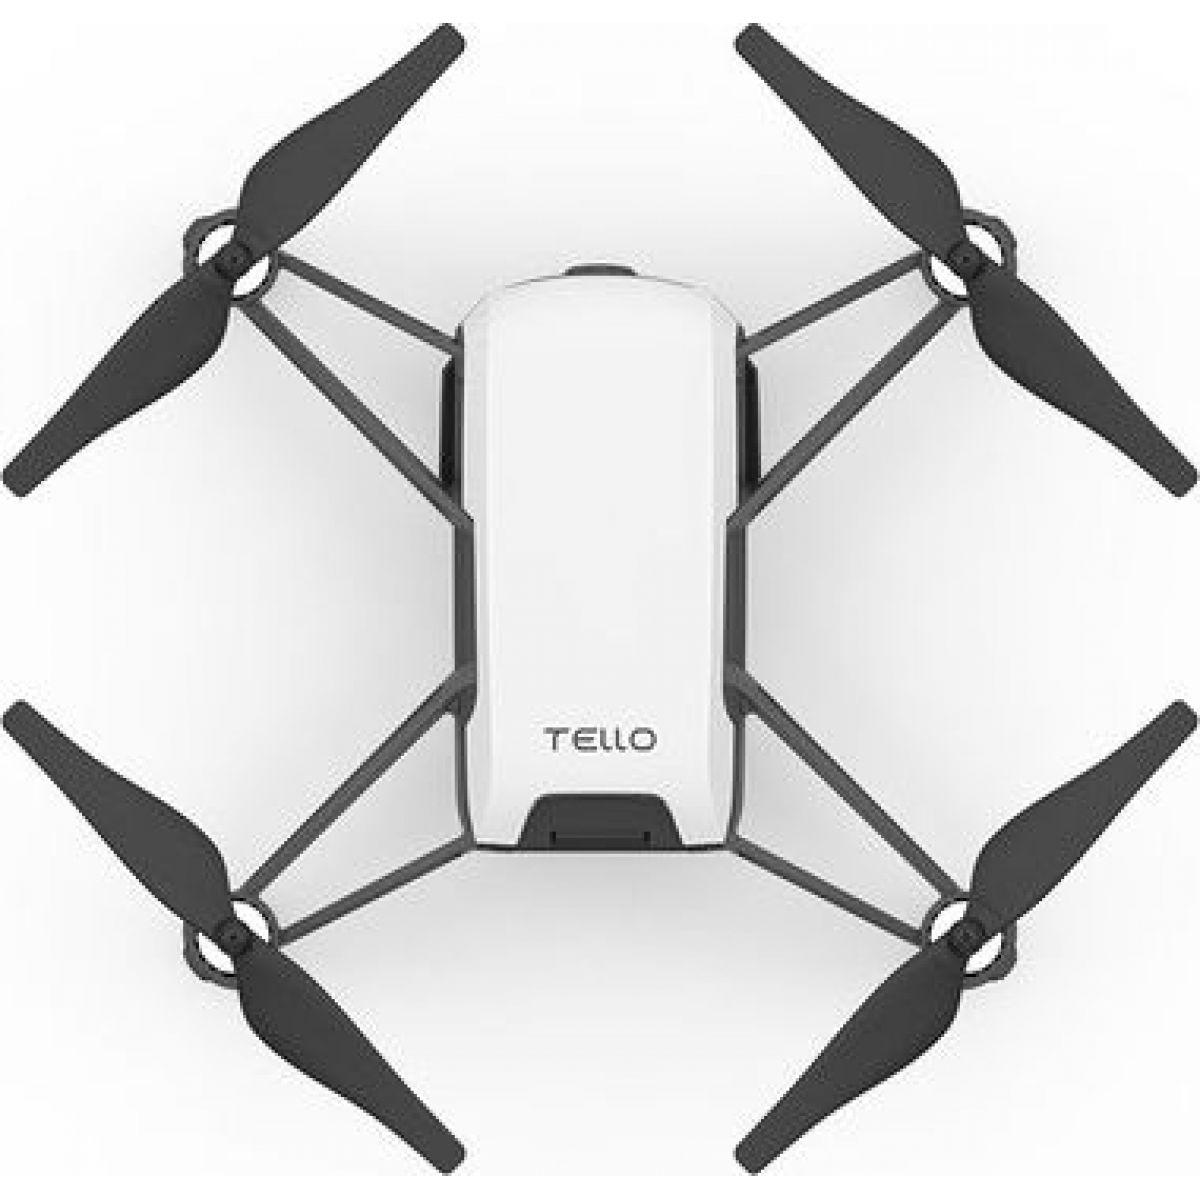 DJI Tello RC Drone